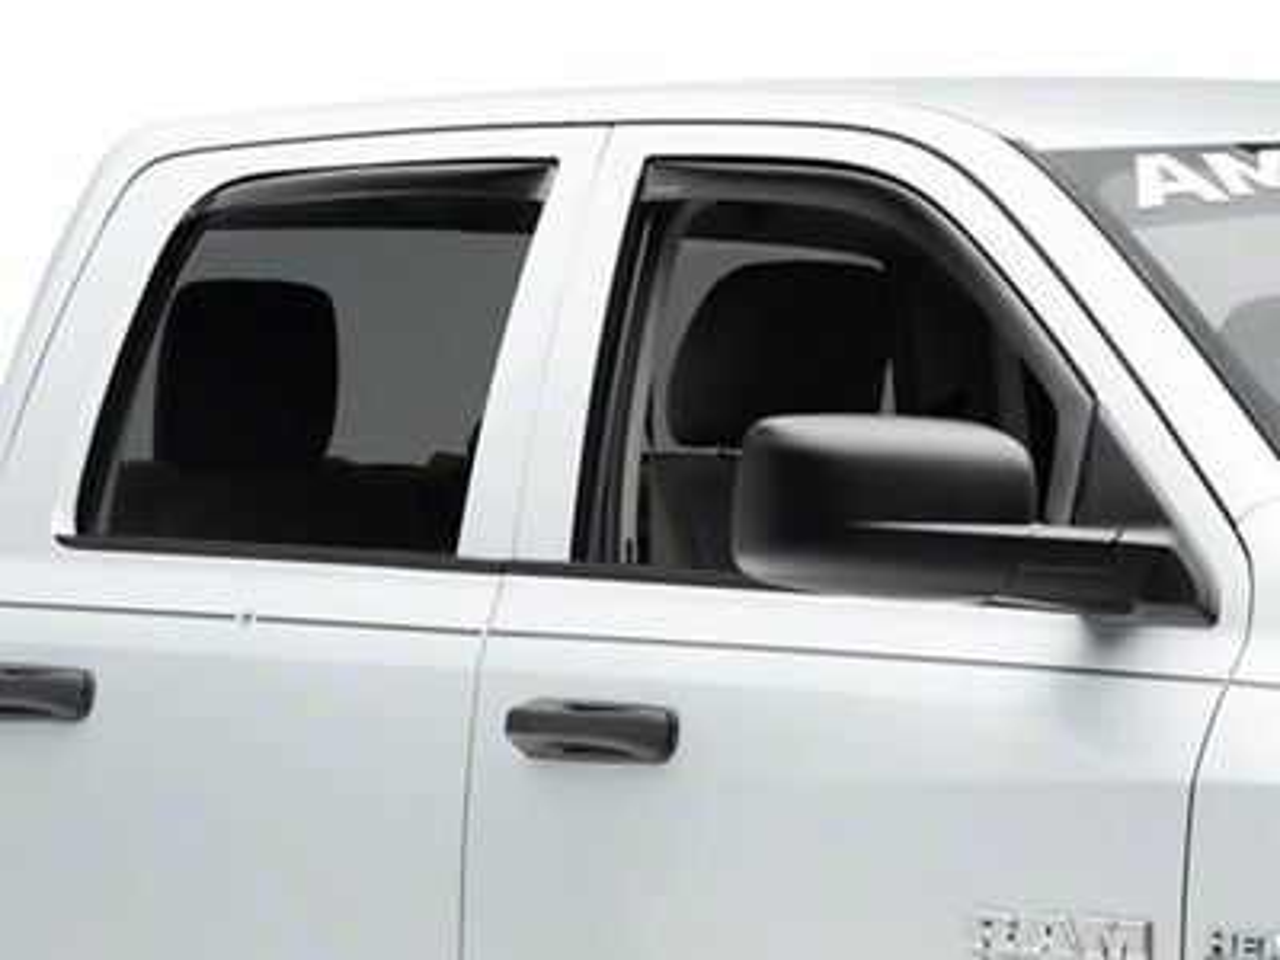 Weathertech Front & Rear Side Window Deflectors - Dark Smoke (09-18 Quad Cab)